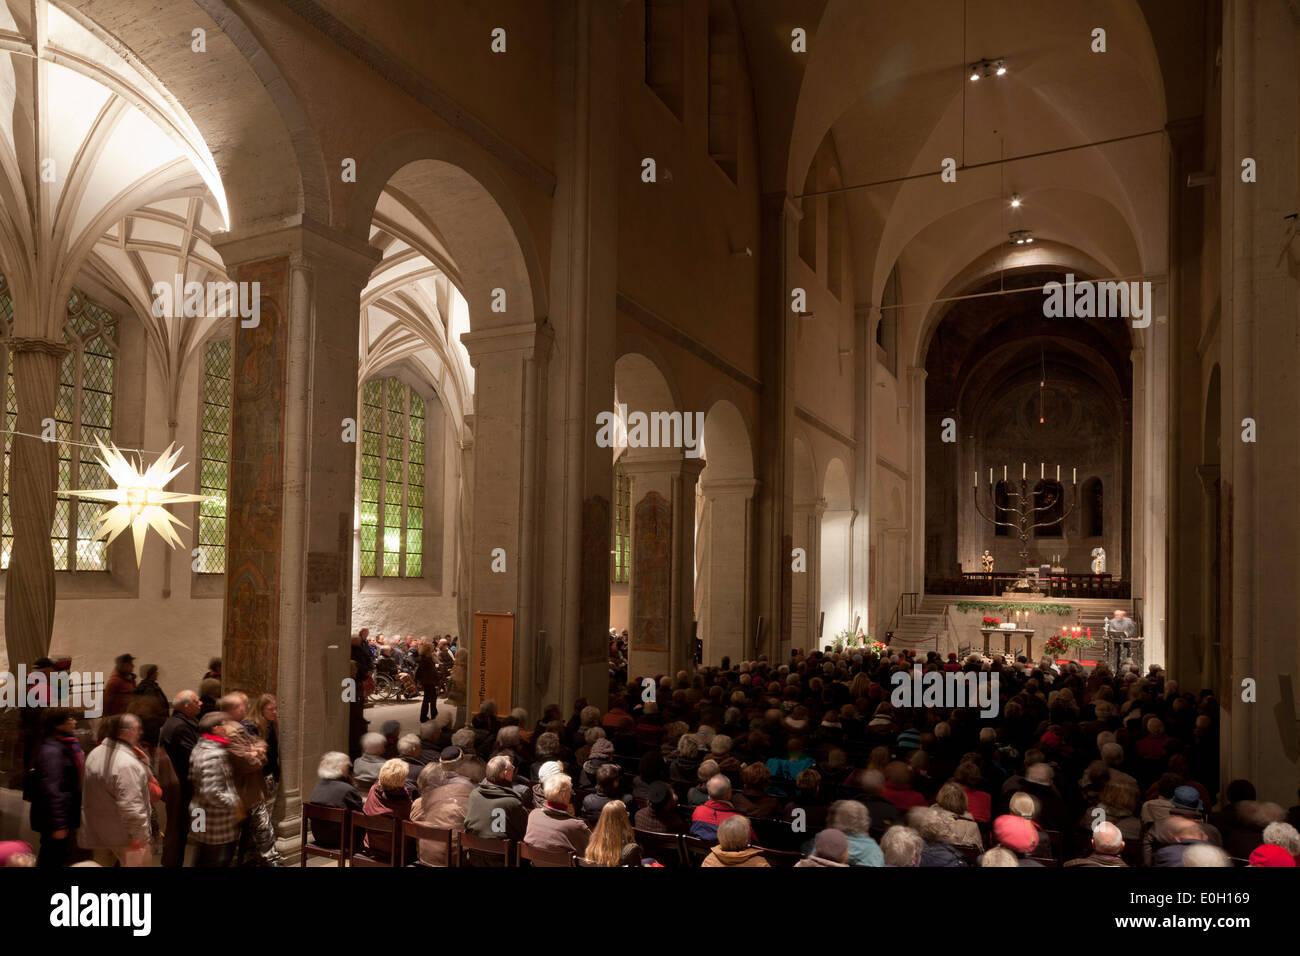 Brunswick cathedral, gothic style, Advent service, Burgplatz, Brunswick, Lower Saxony, Germany - Stock Image